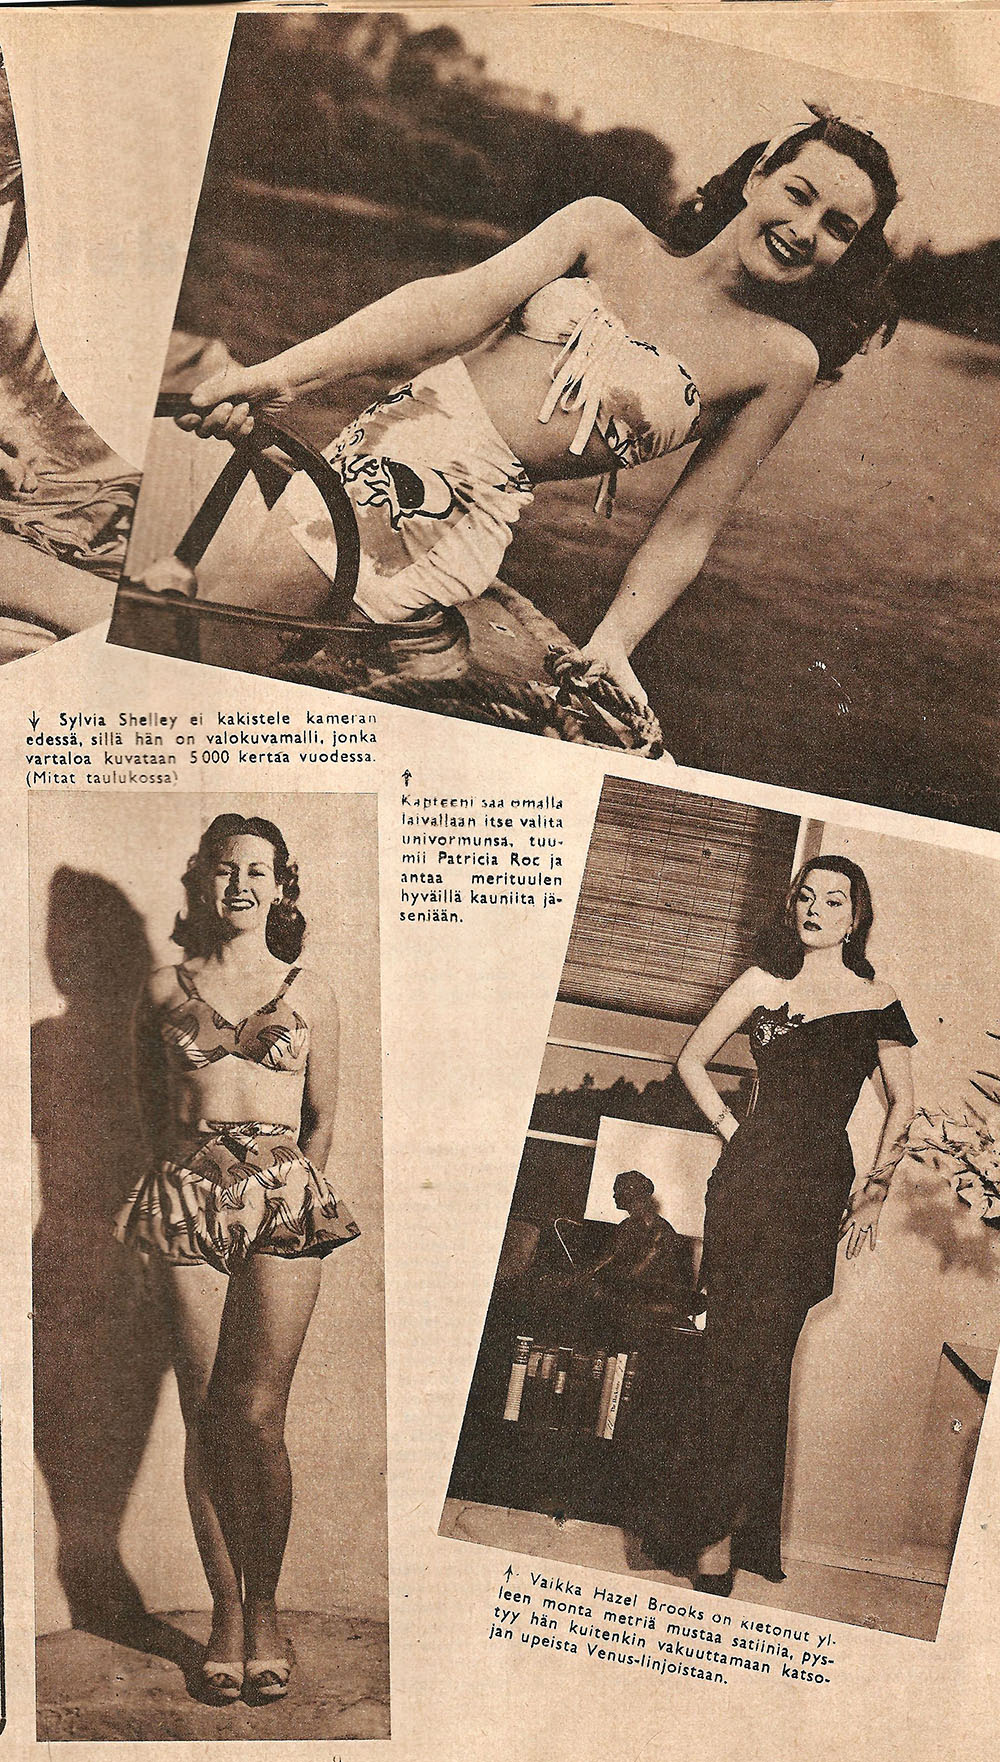 1940smeasurem